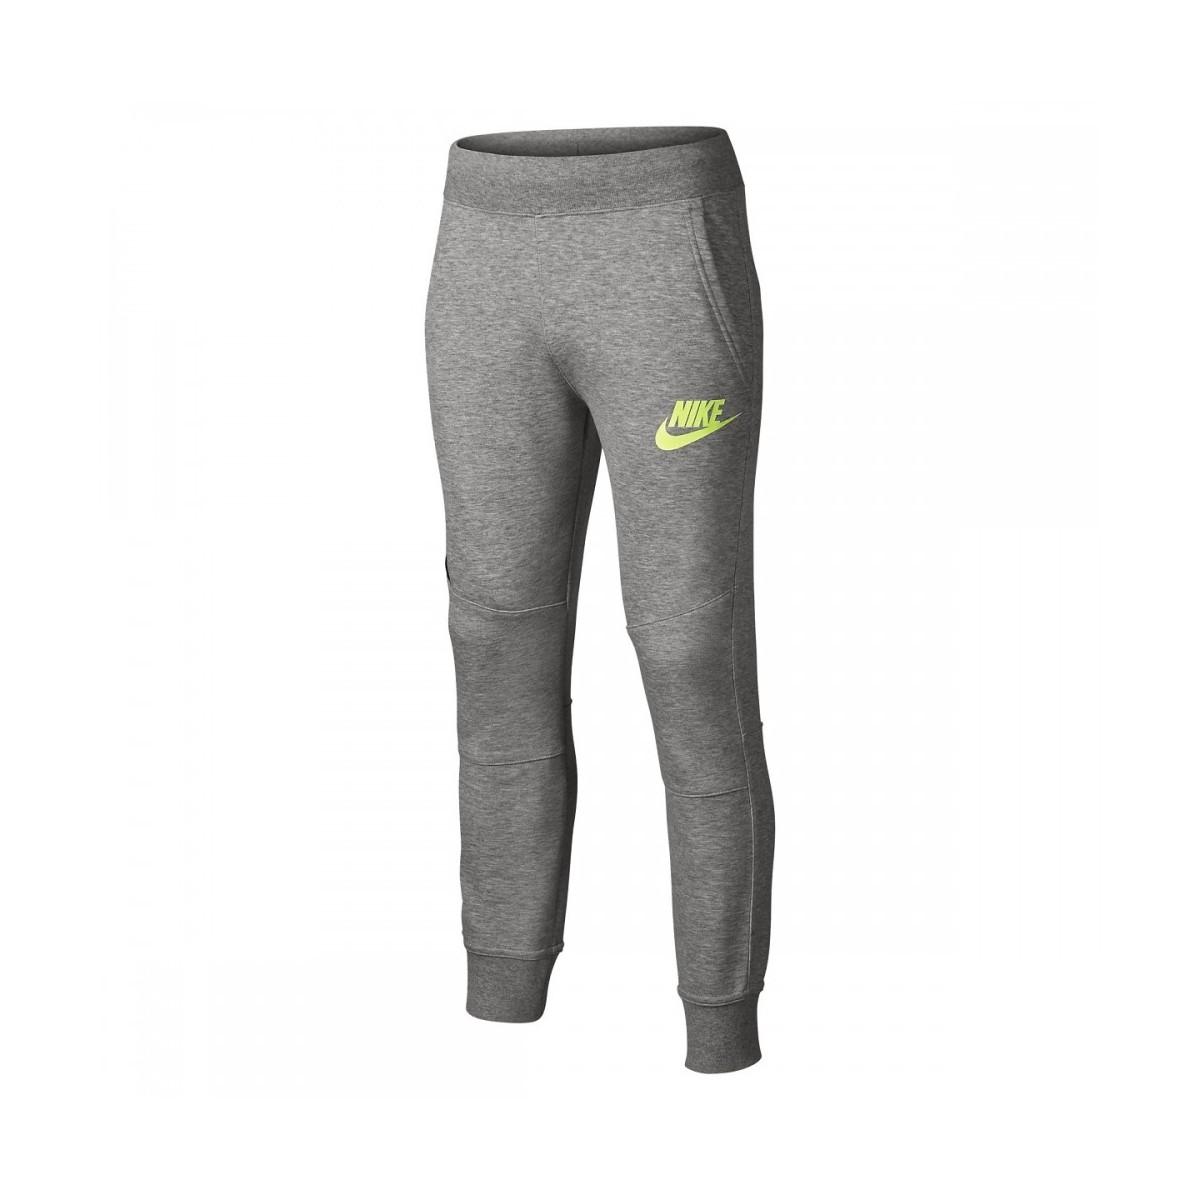 Pantalon de survêtement nike Tech Fleece Junior